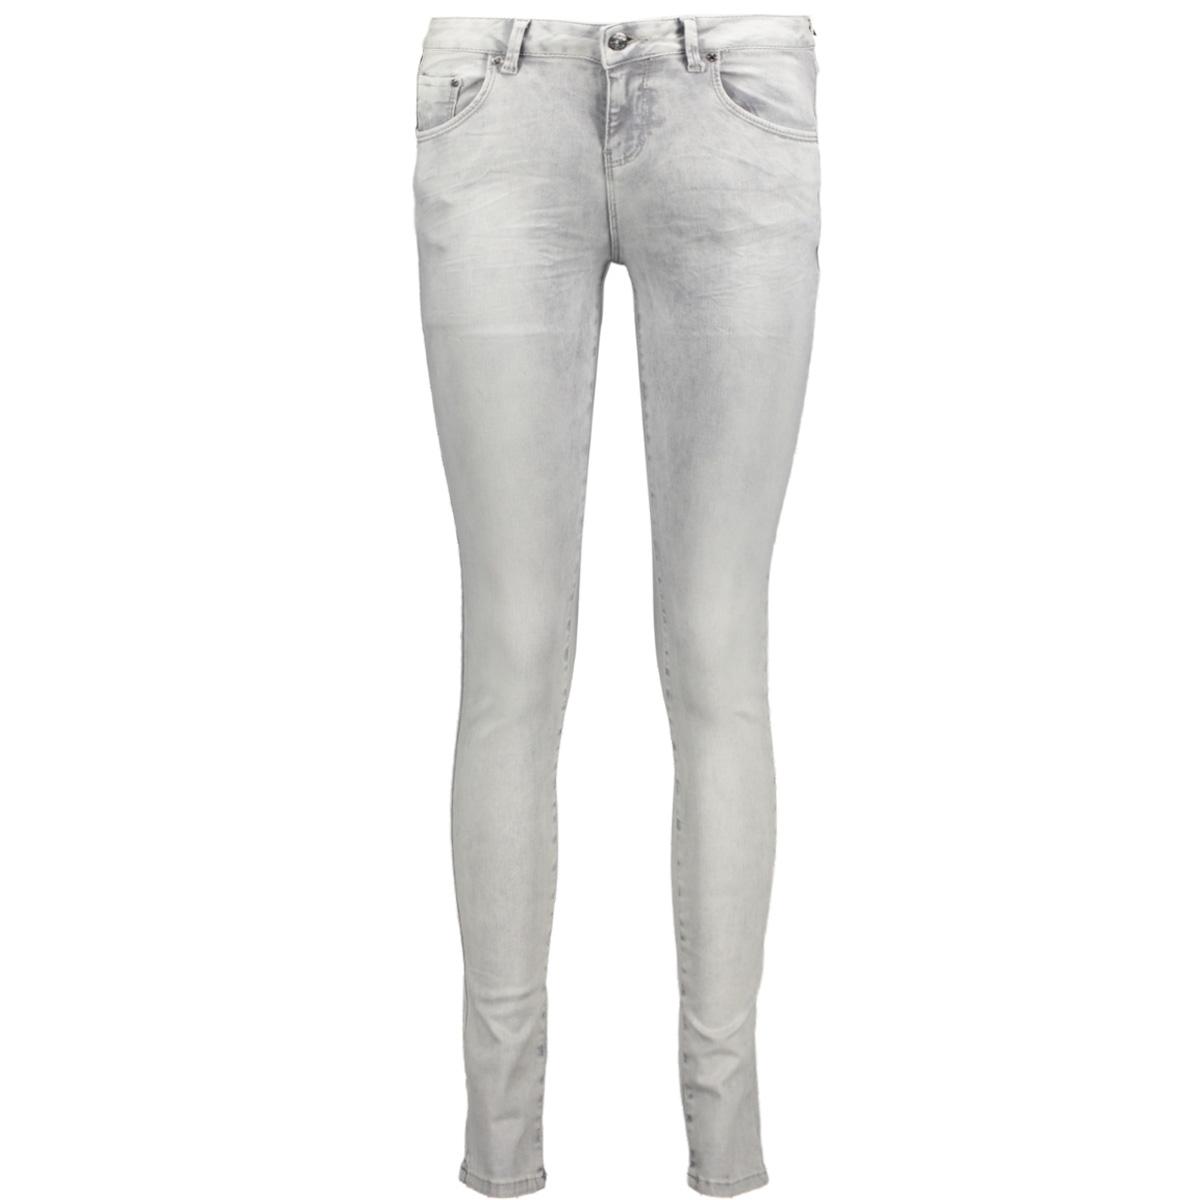 daisy 100951169 13510 ltb jeans grey ice und wash